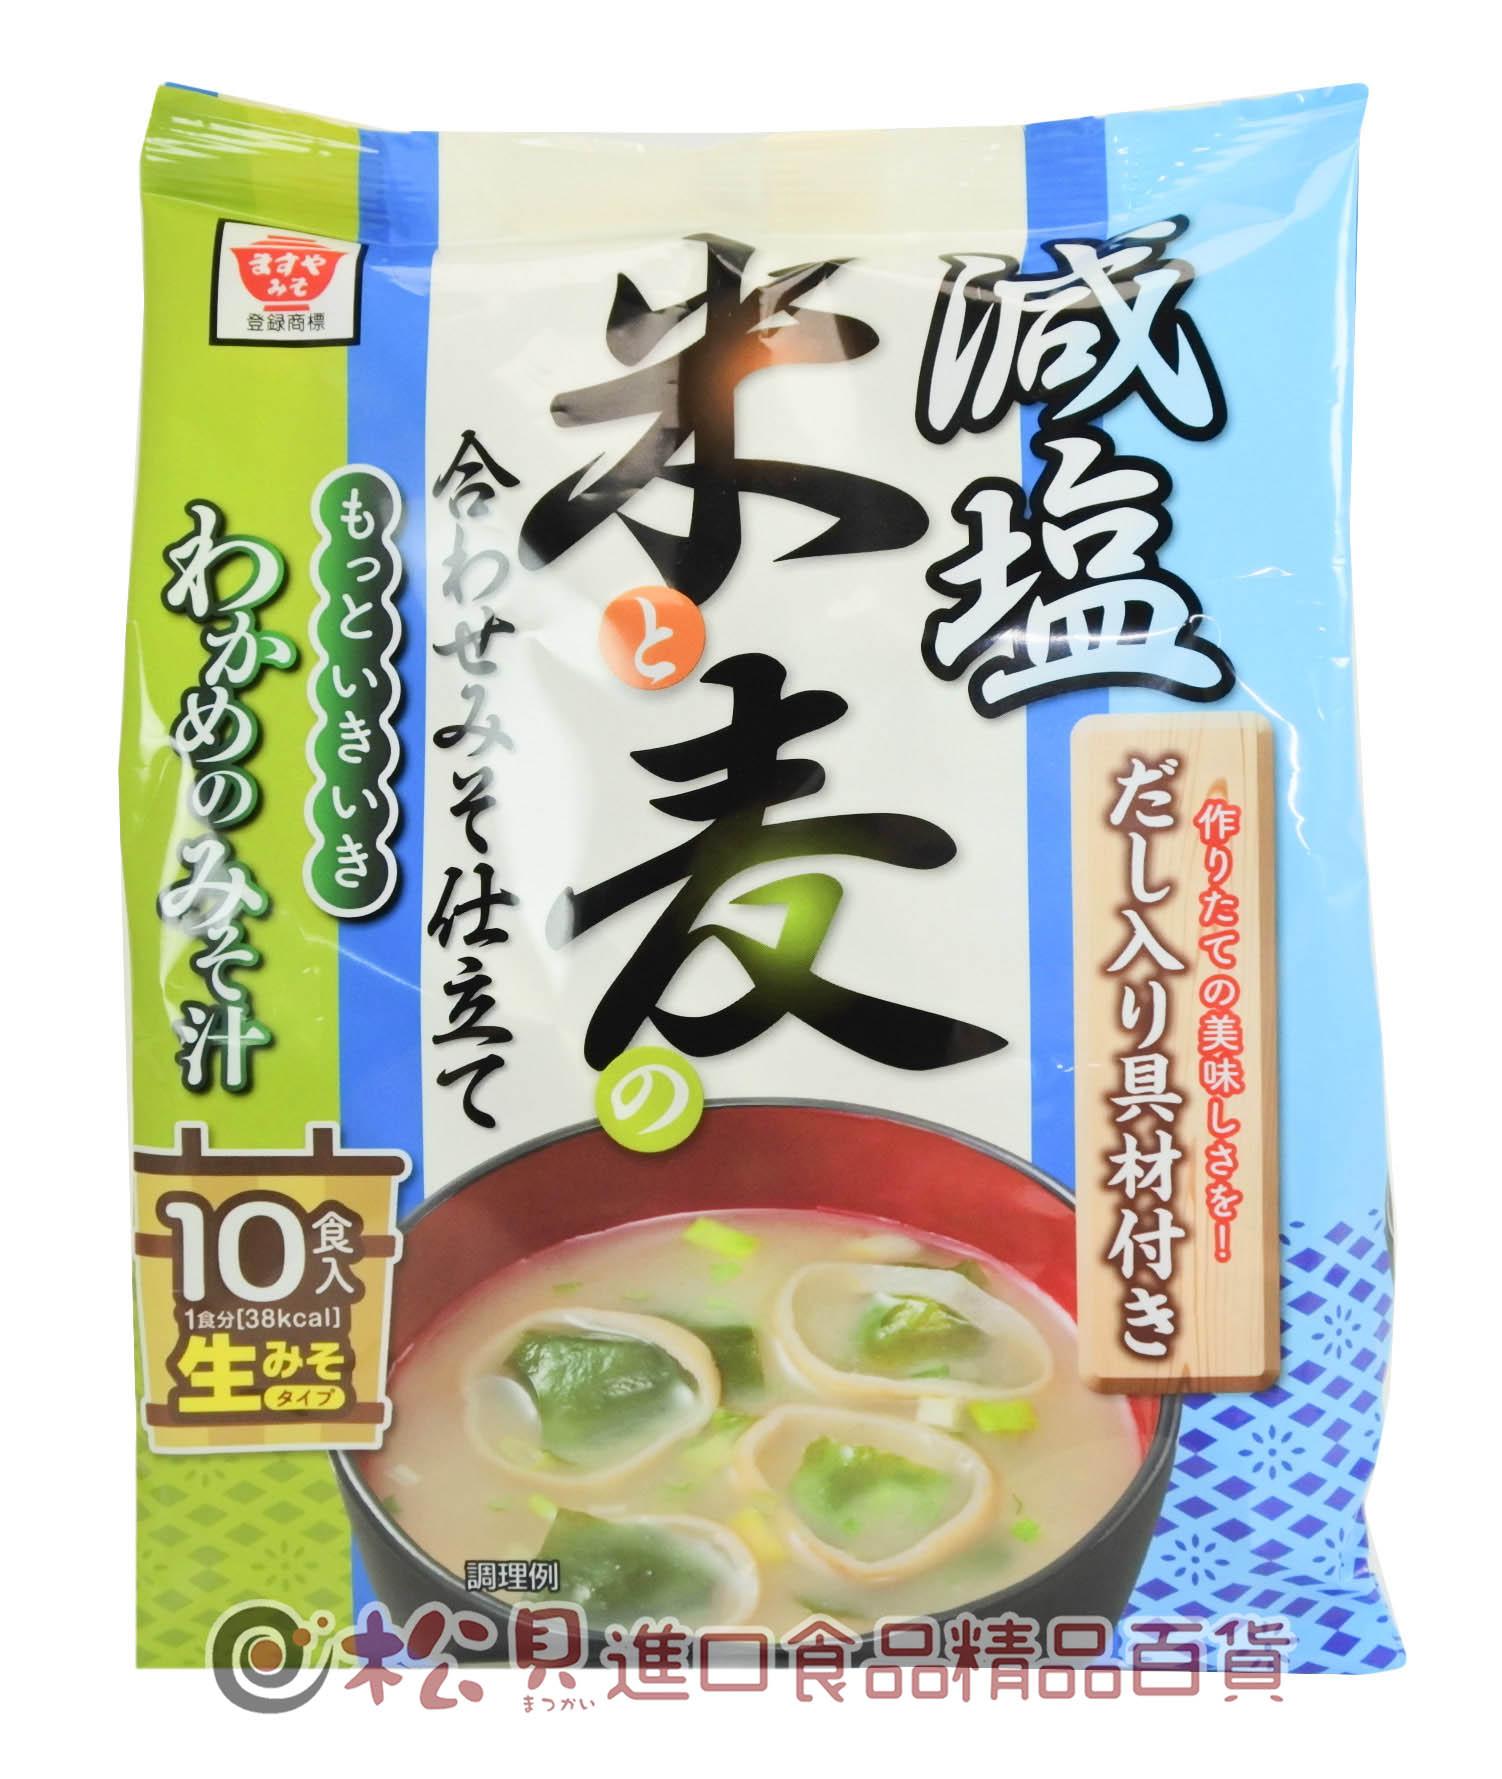 Masuya即席米麥減鹽味噌湯10食入204g【4902826232824】